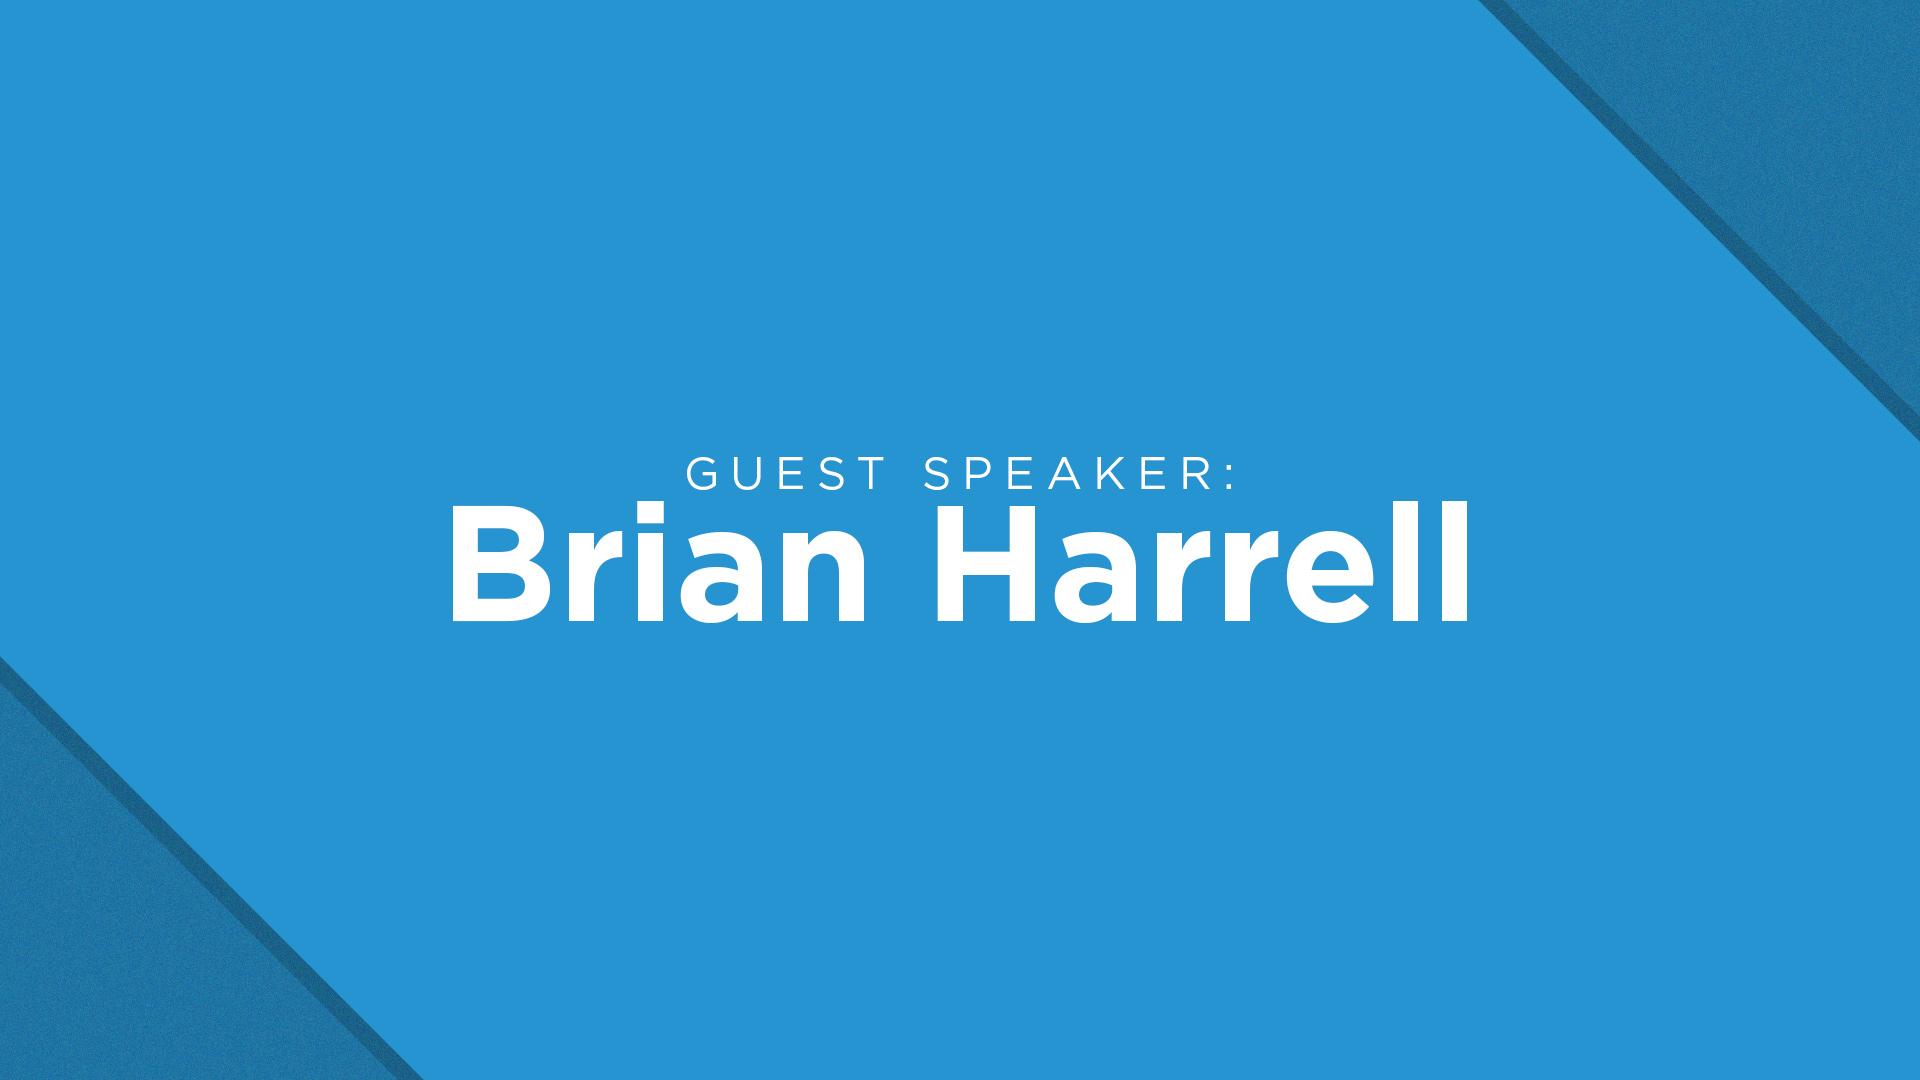 Guest Speaker: Brian Harrell